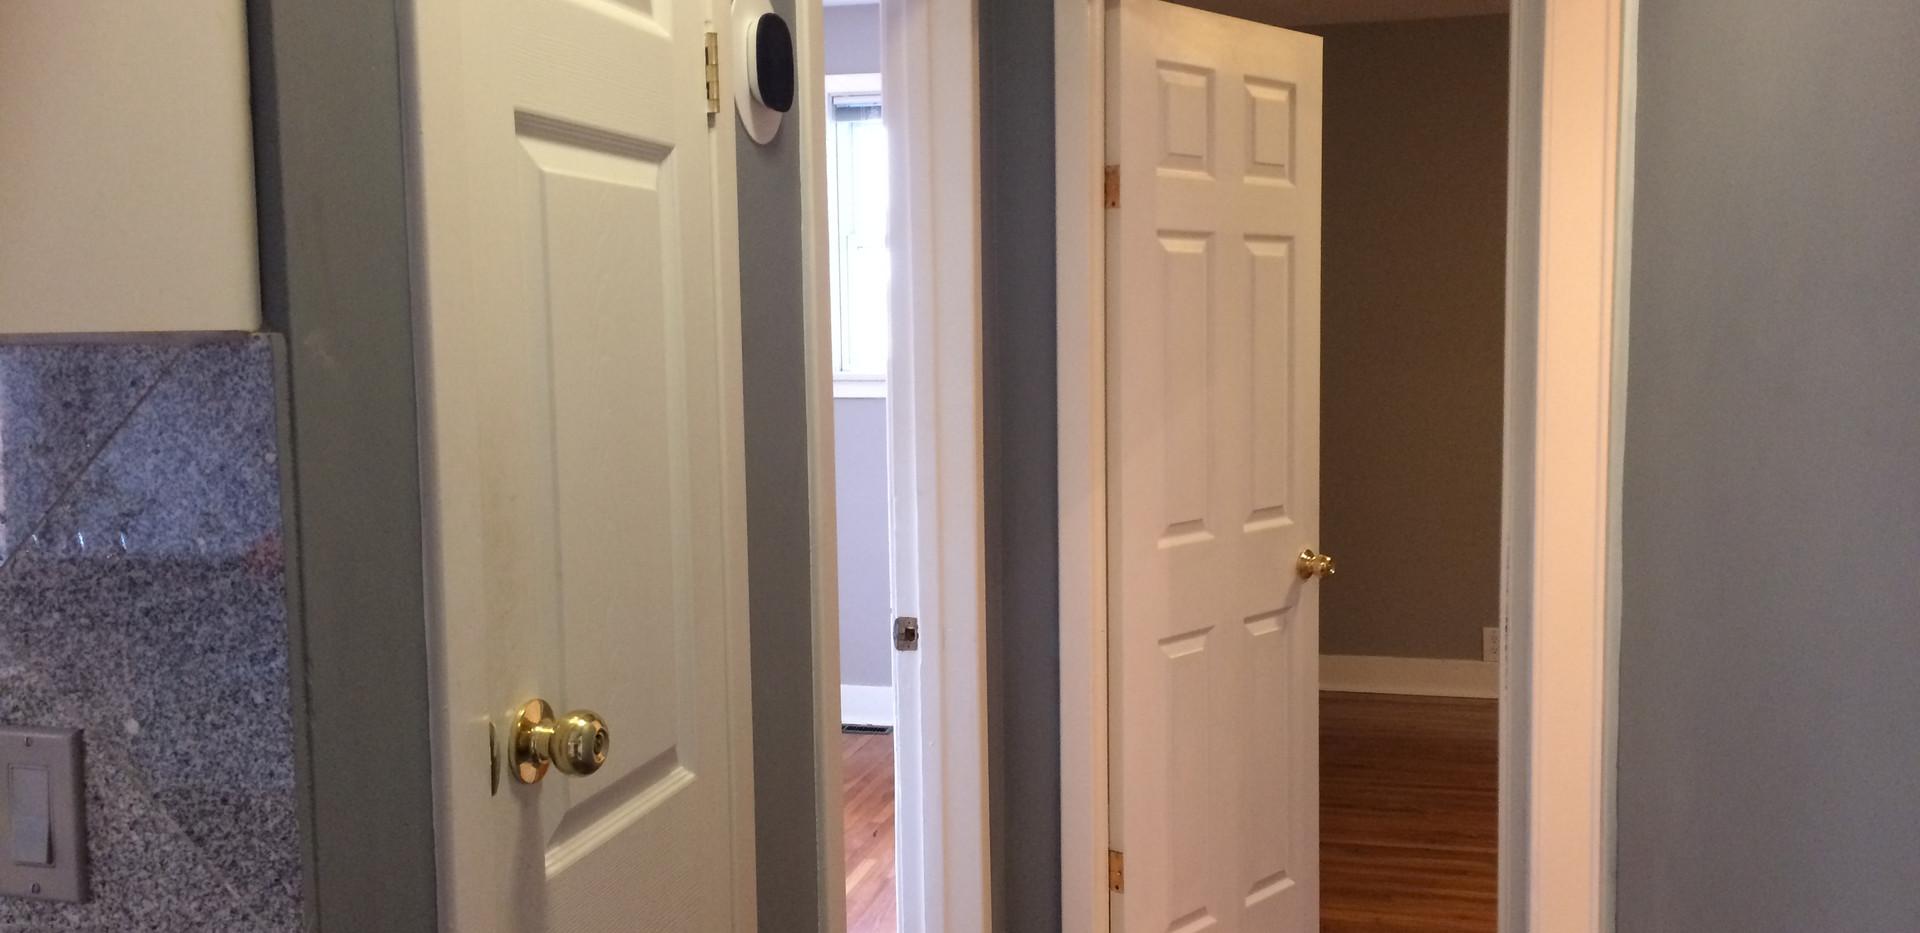 11-Hallway.JPG